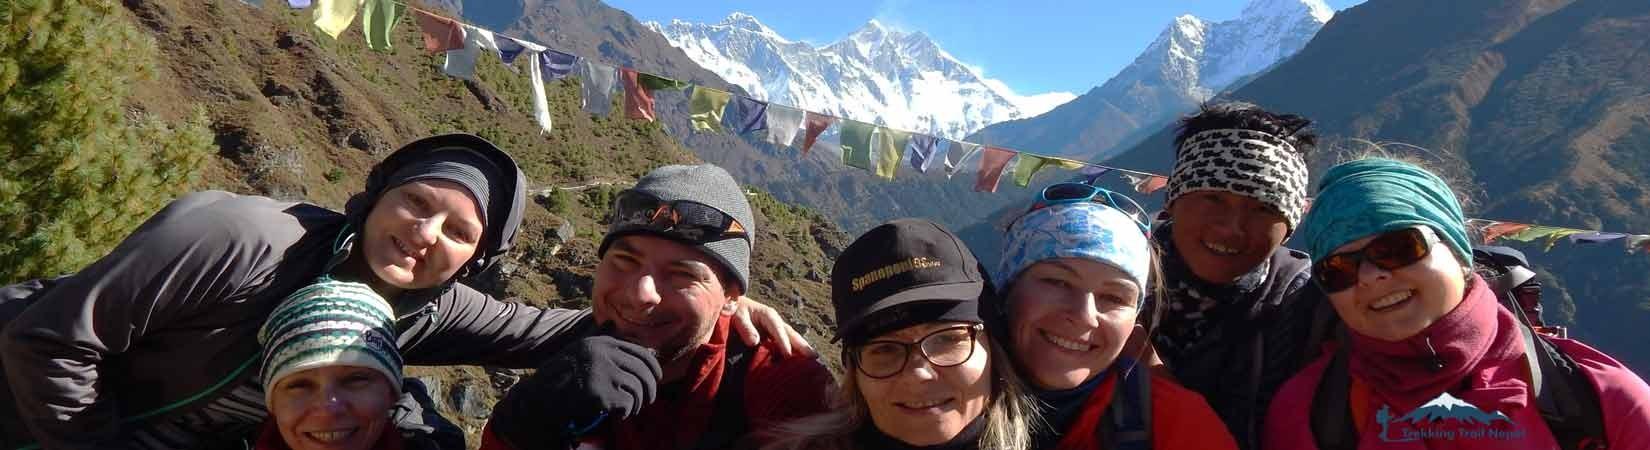 Hello Everest Trekking